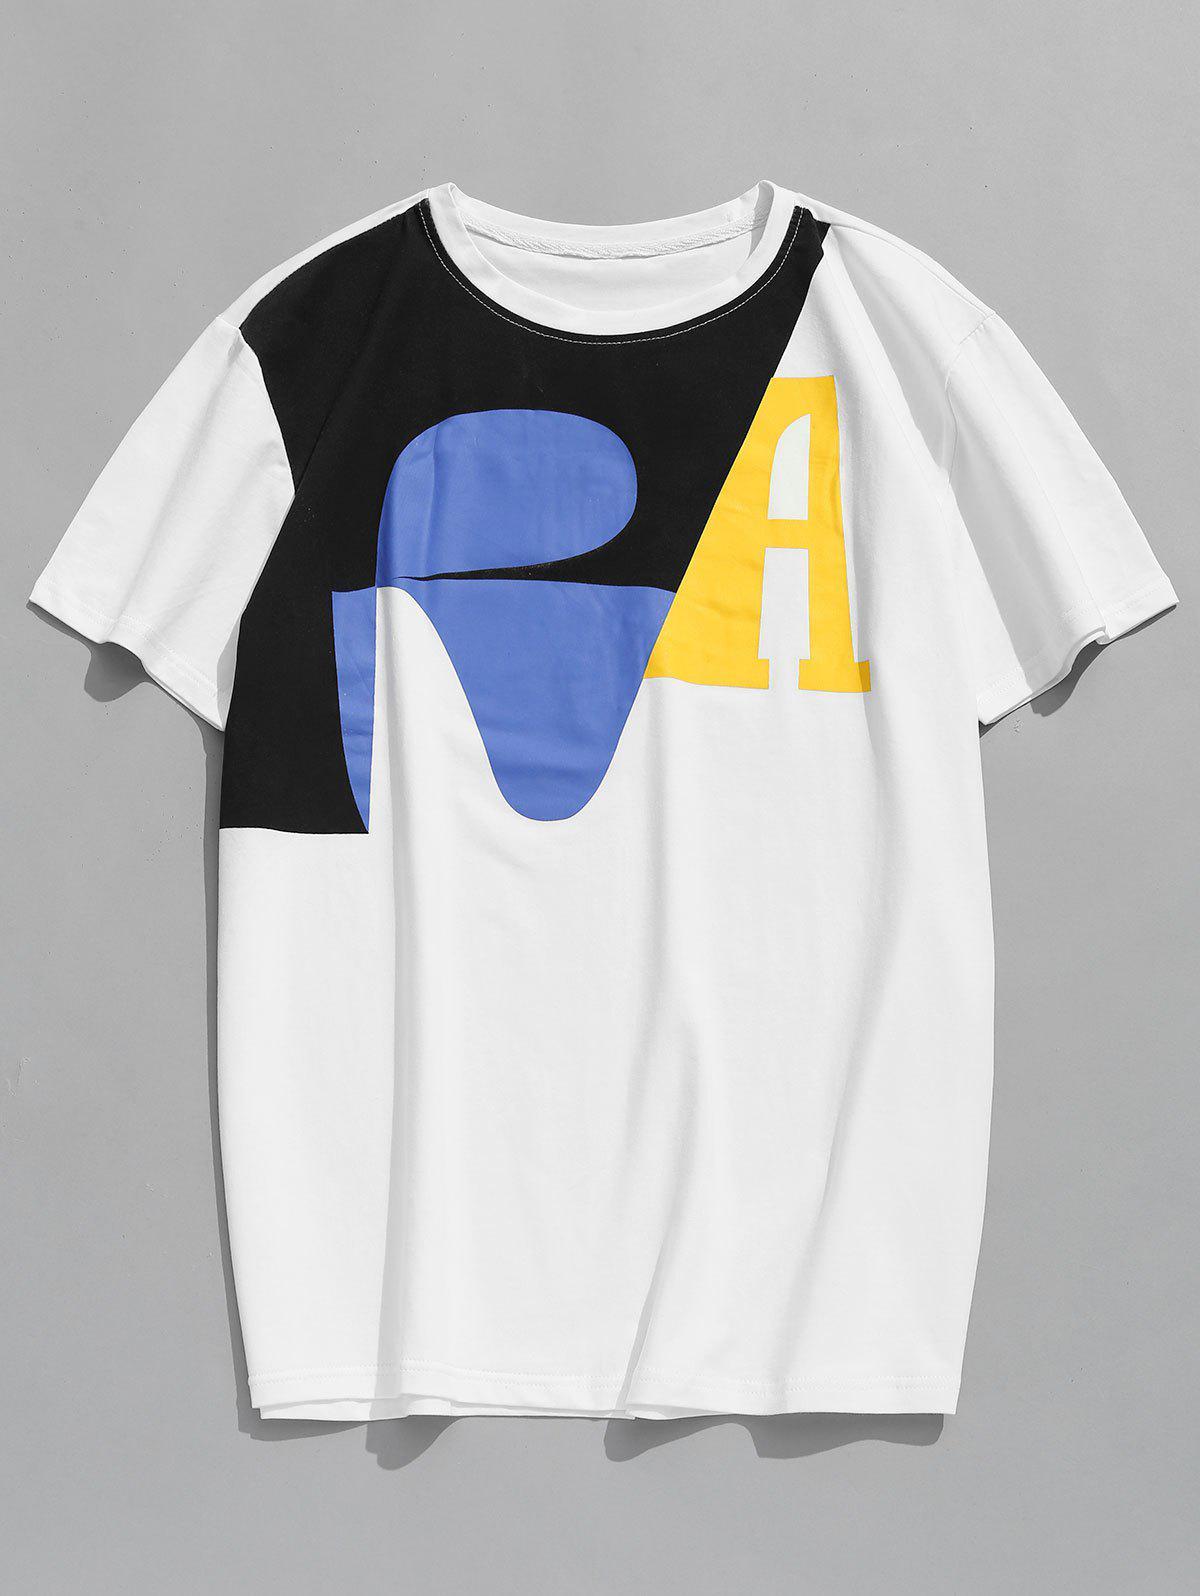 Short Sleeves Patterned T-shirt, White